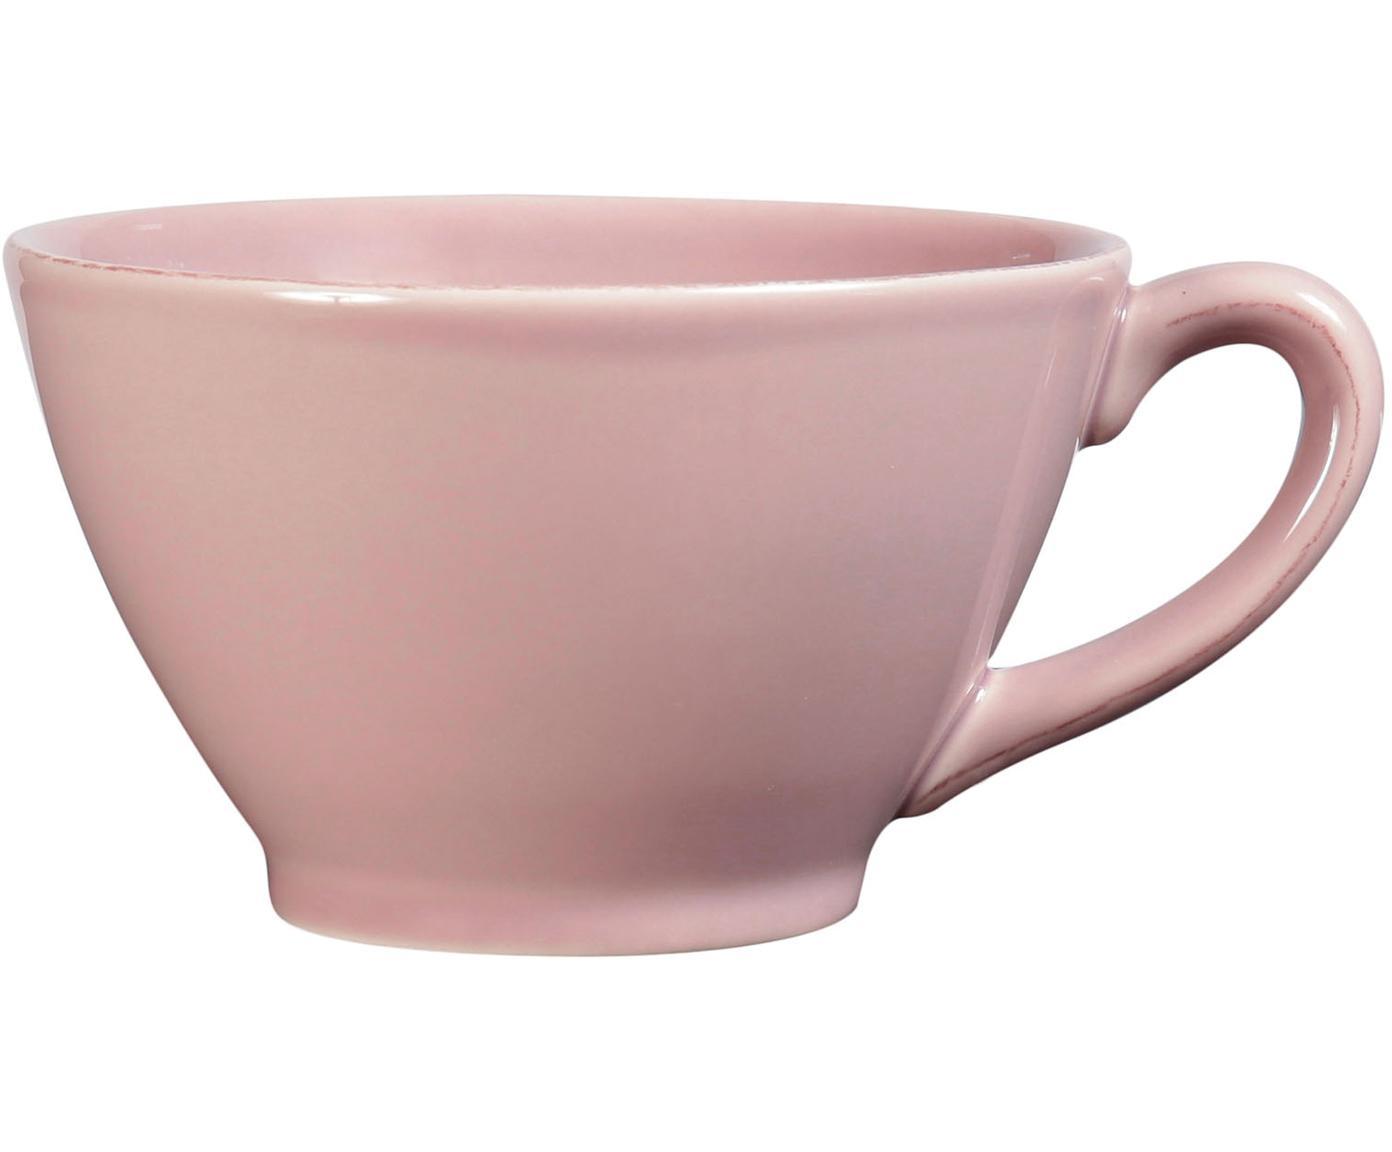 XL-koffiekop Constance, Keramiek, Roze, Ø 18 x H 9 cm